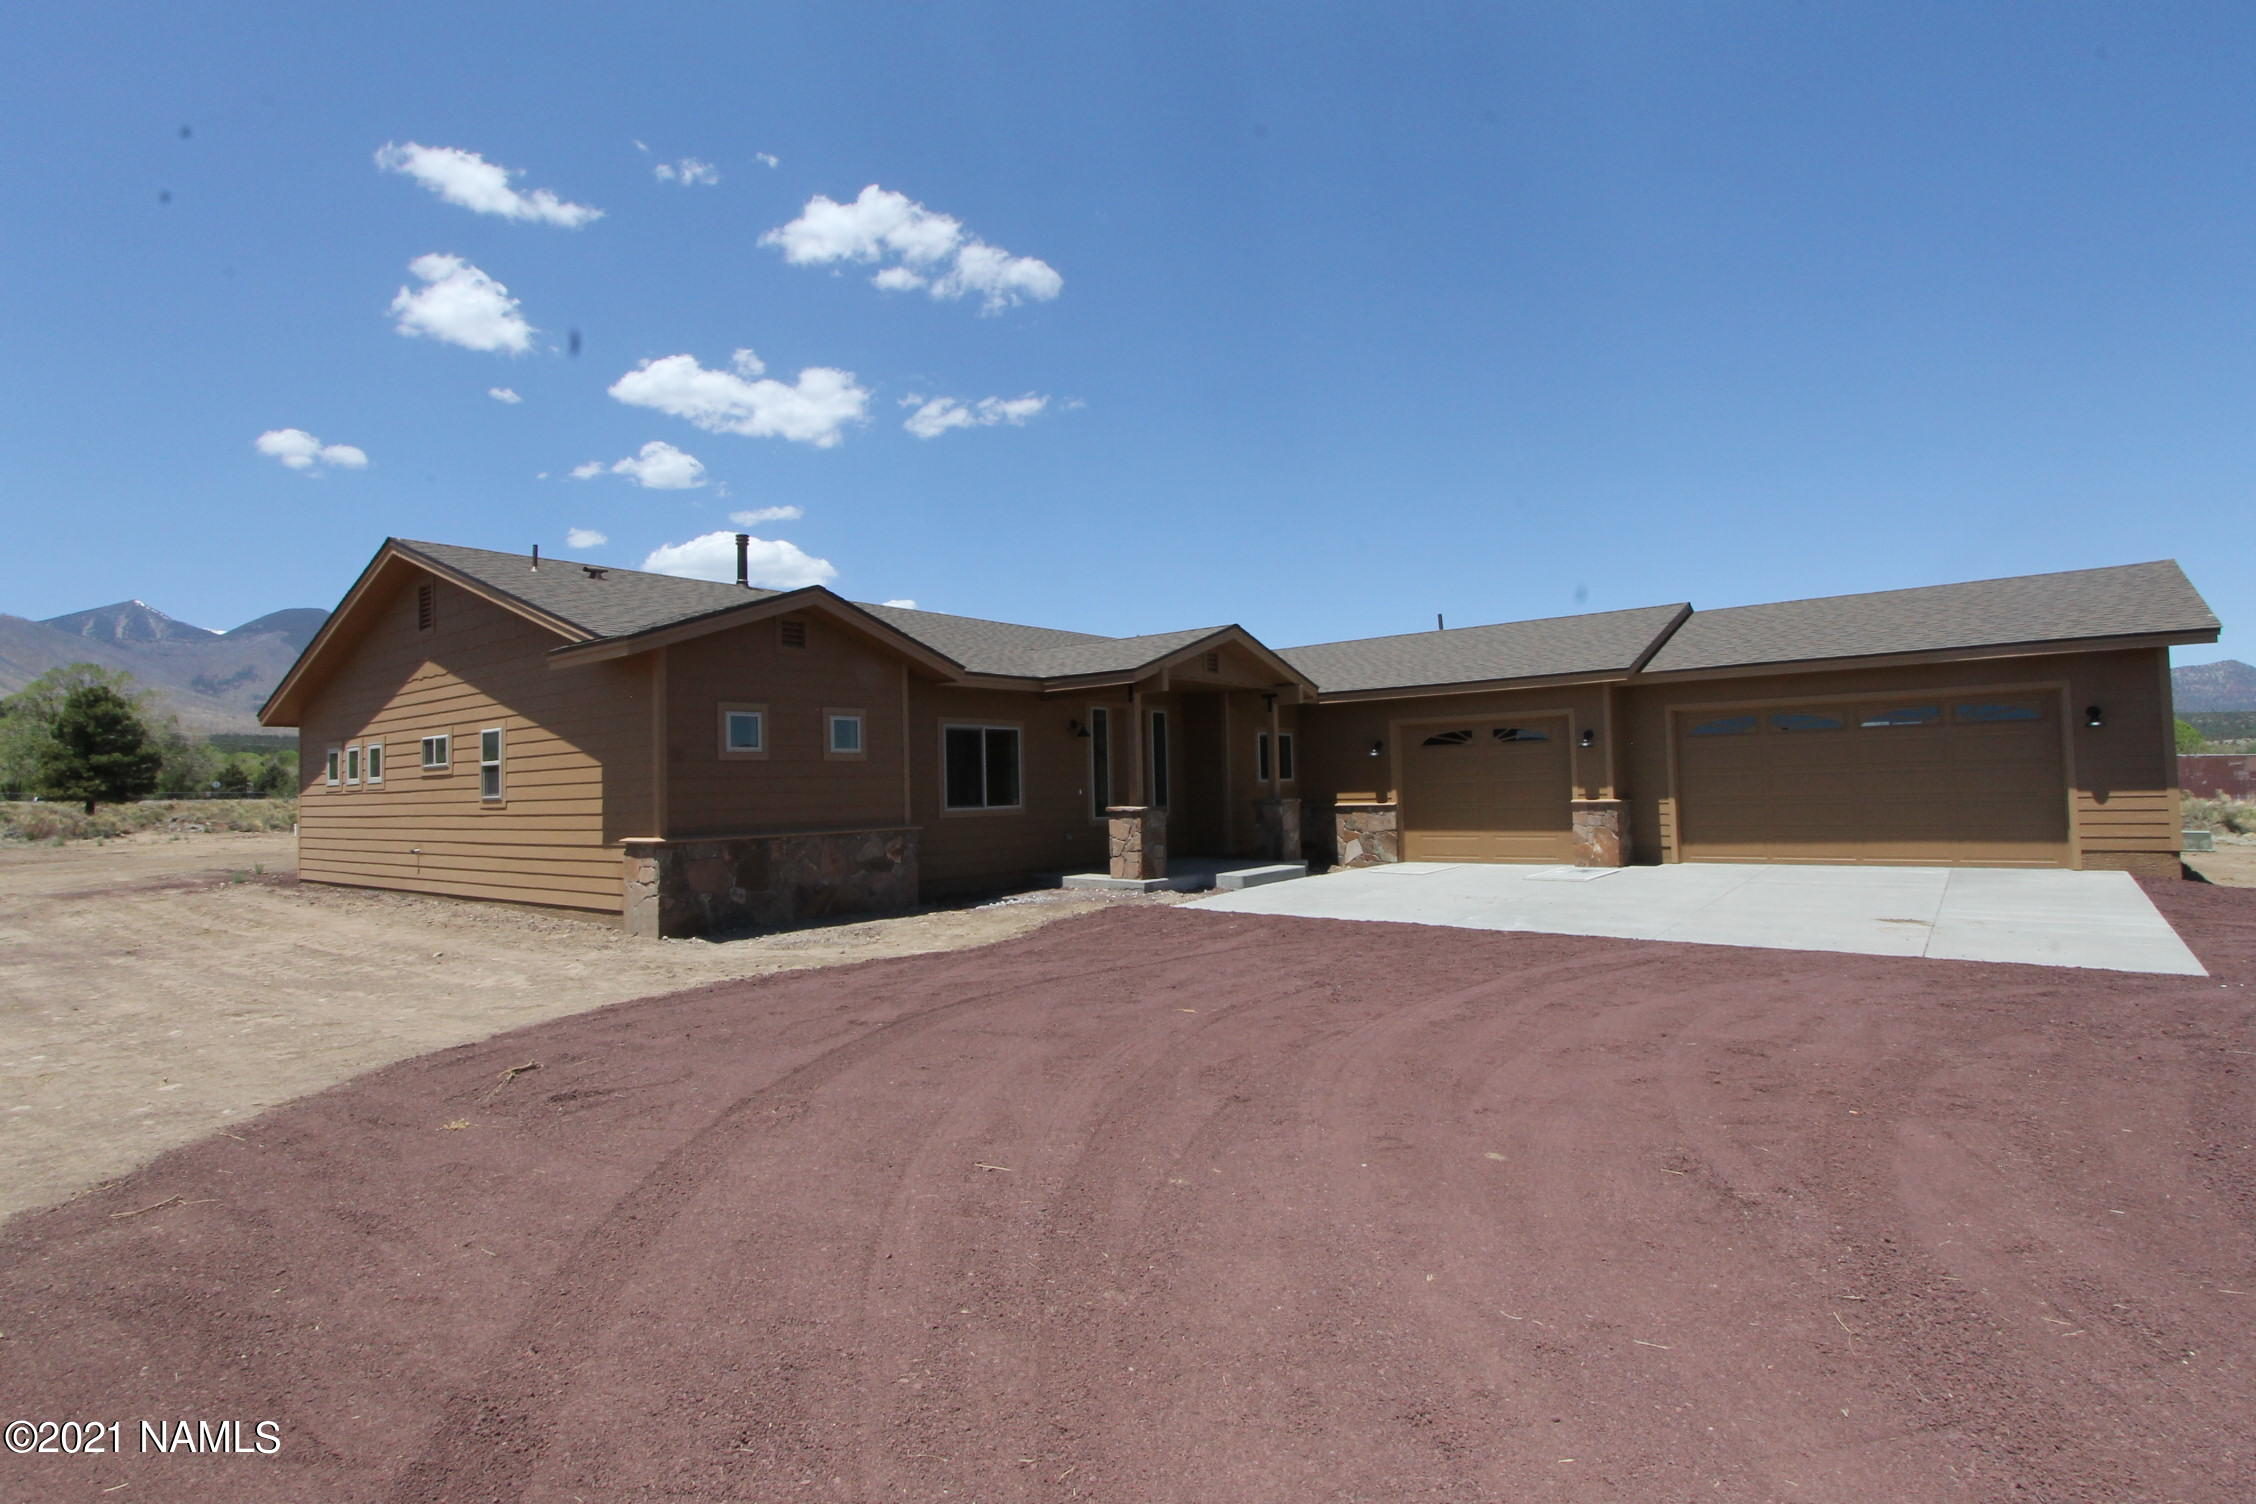 Photo of 11555 Us Highway 89, Flagstaff, AZ 86004